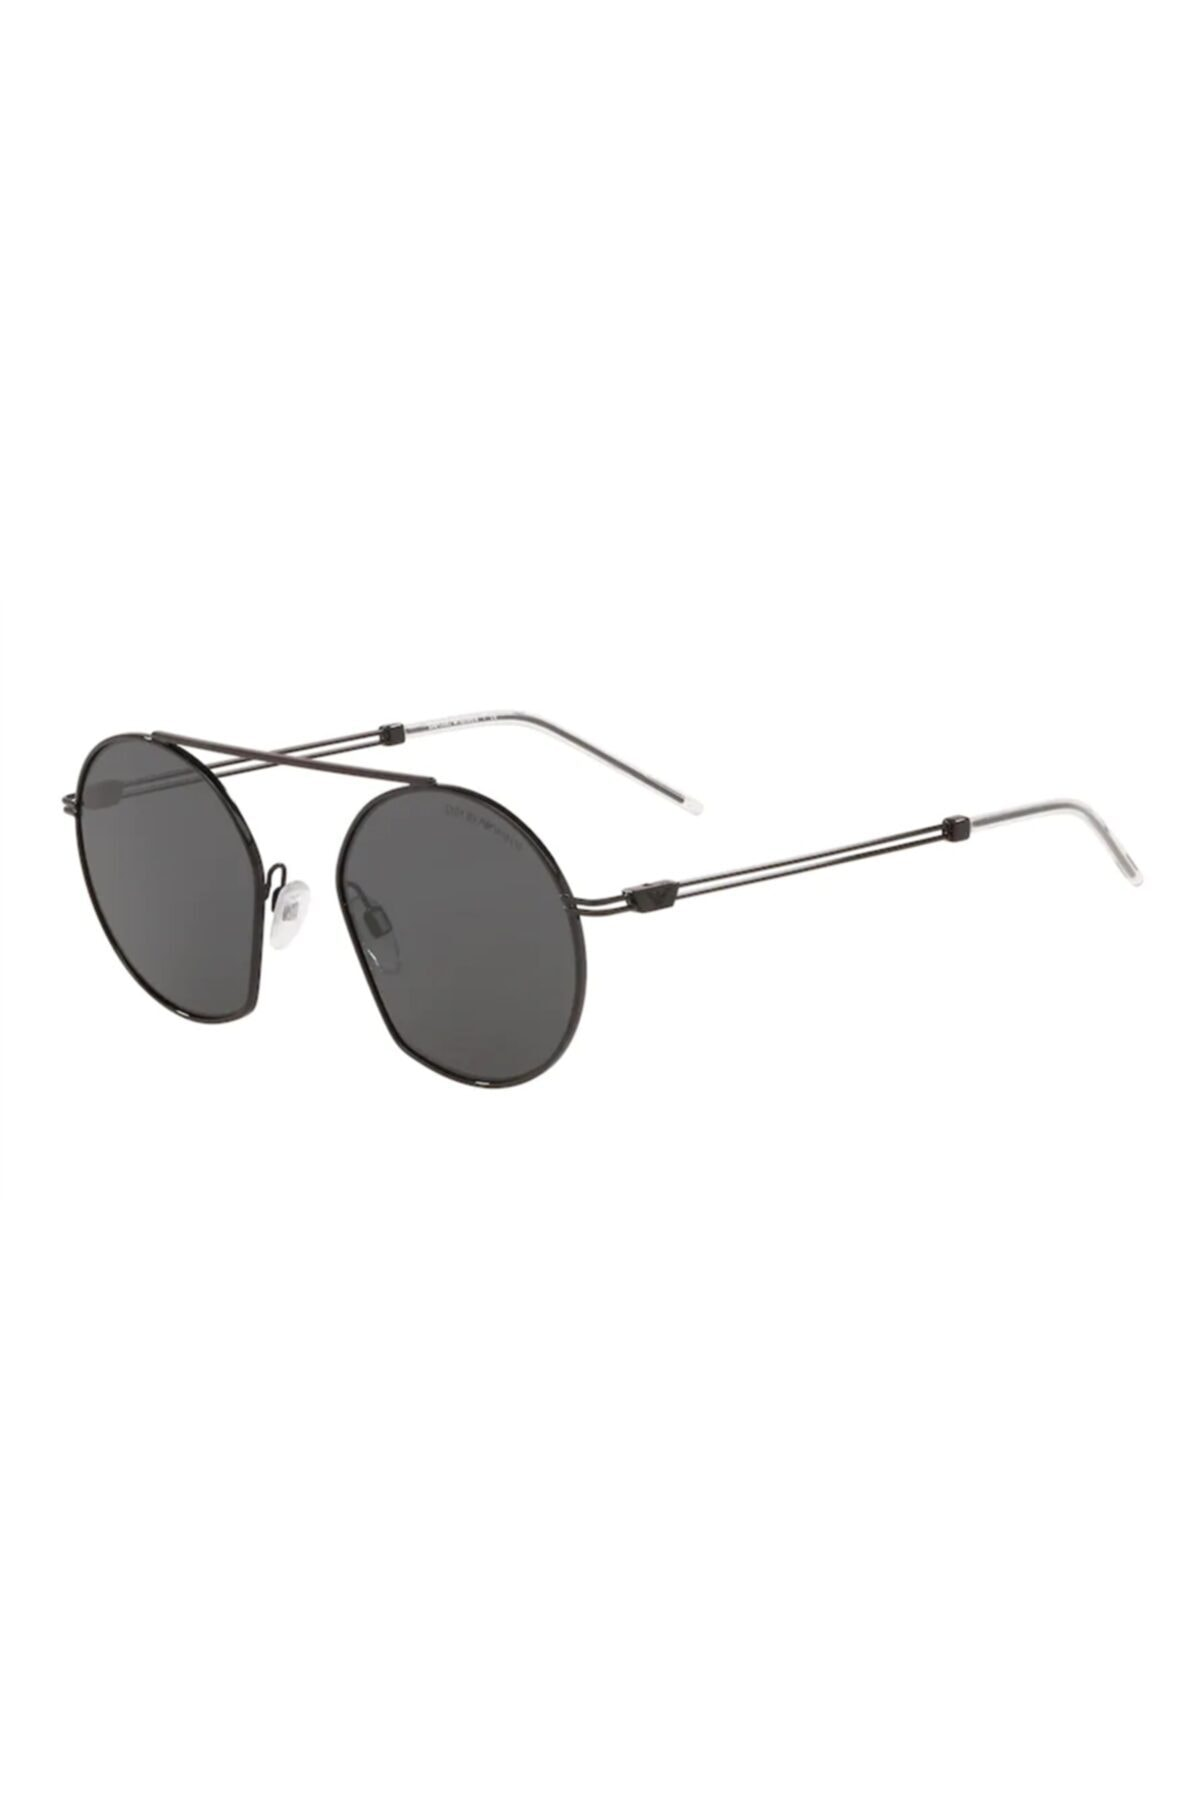 عینک دودی یونیسکس فروش برند امپریو آرمانی رنگ مشکی کد ty48908823